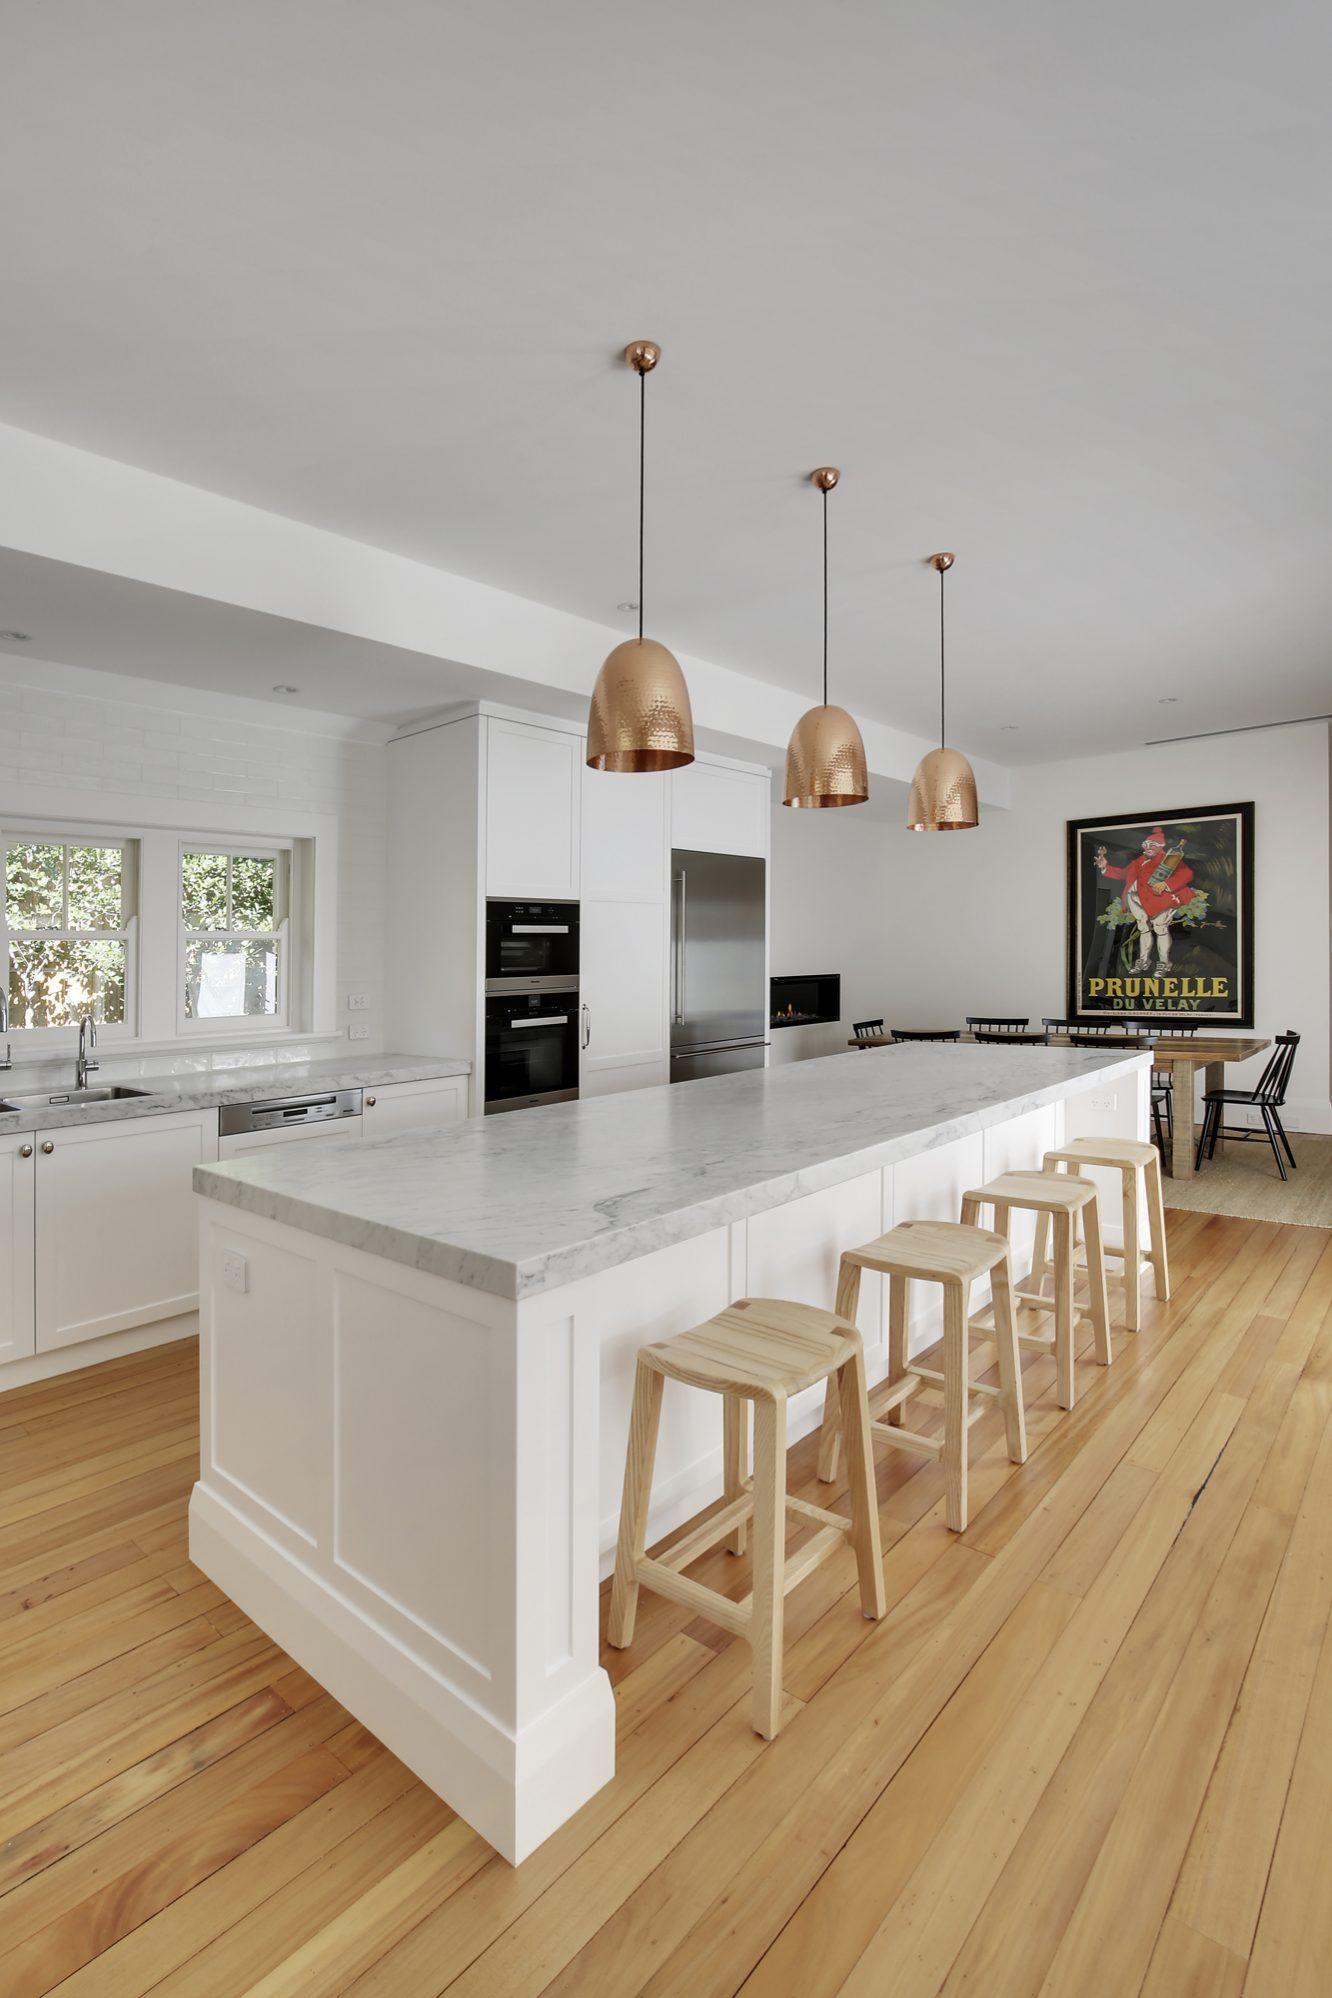 Killara Bespoke Kitchen in 2020 Kitchen design, Shaker